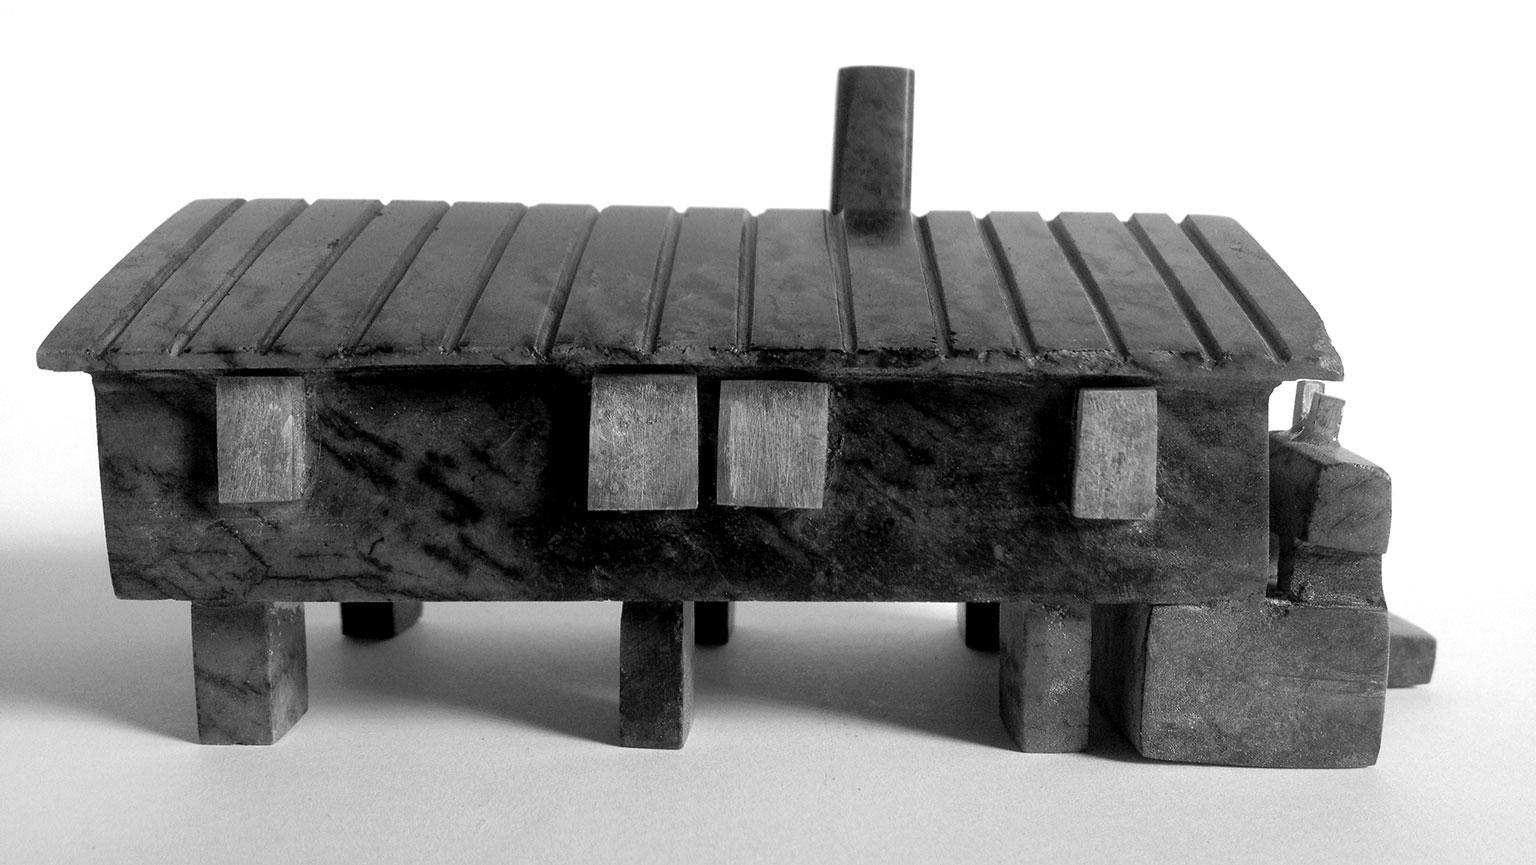 Carving by Malaya Pitsiulak/image courtesy of Arctic Adaptations